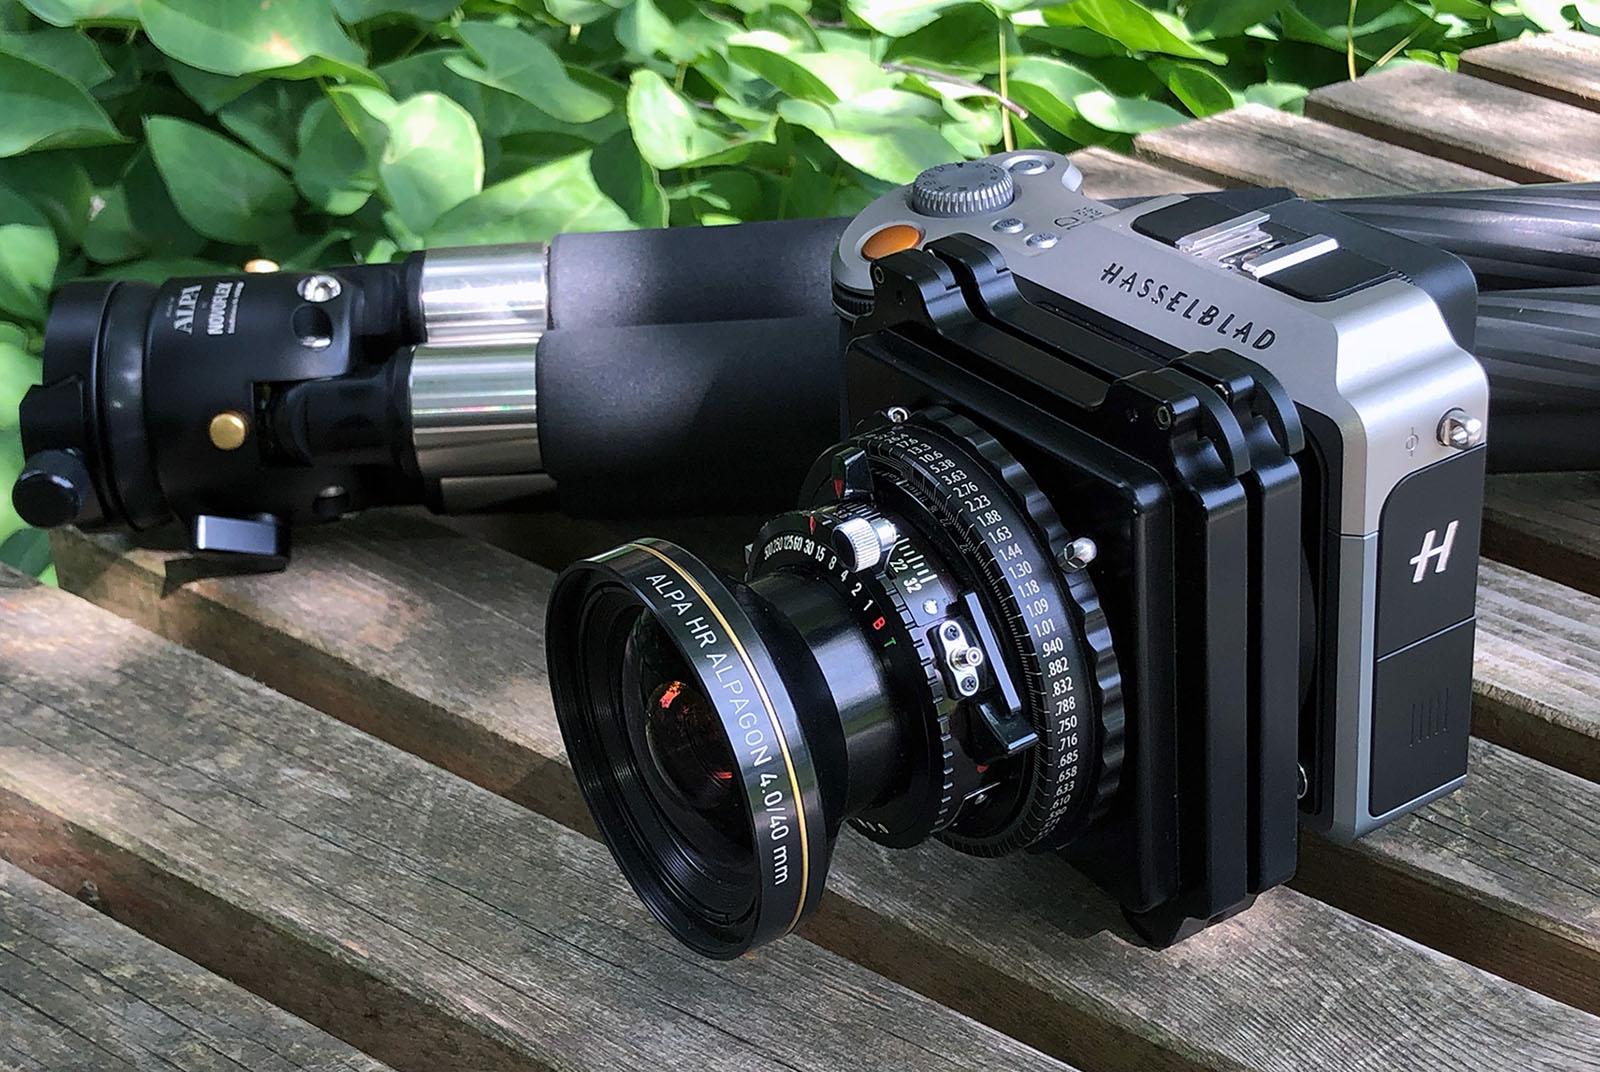 ALPA HR Alpagon 4.0/40 mm FPS SB17 combined with Hasselblad X1D ©ALPA André Oldani